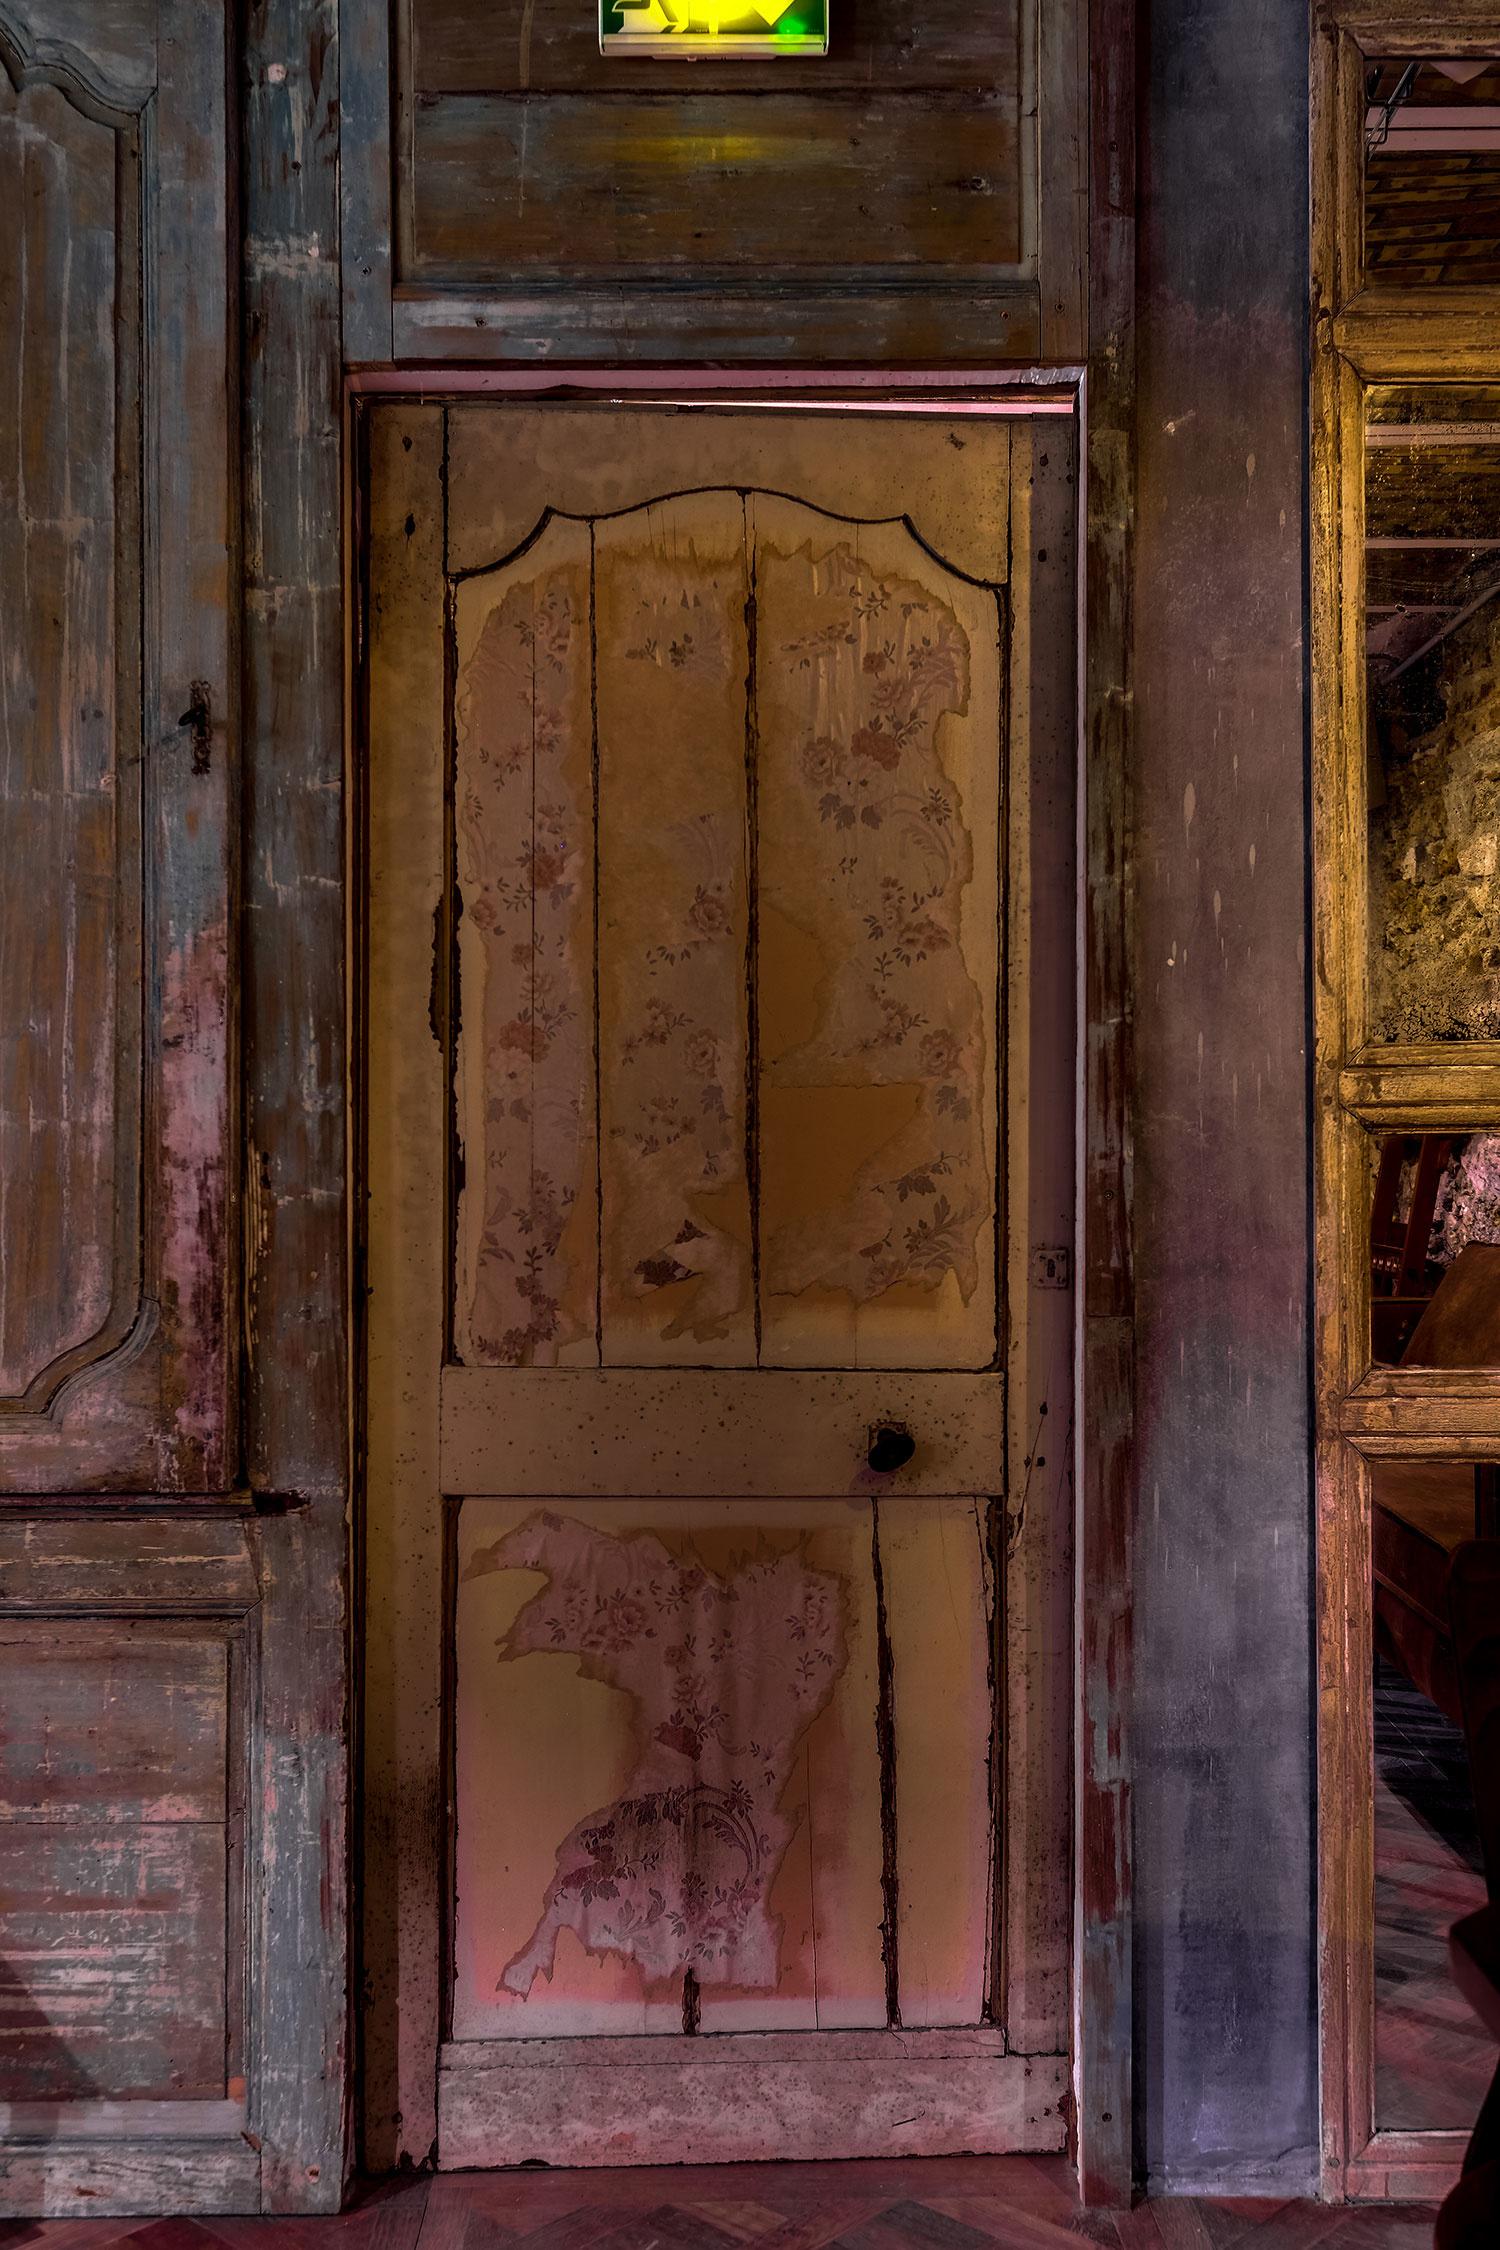 Парижский ресторан Jacopo – проект Натальи Белоноговой (галерея 20, фото 2)